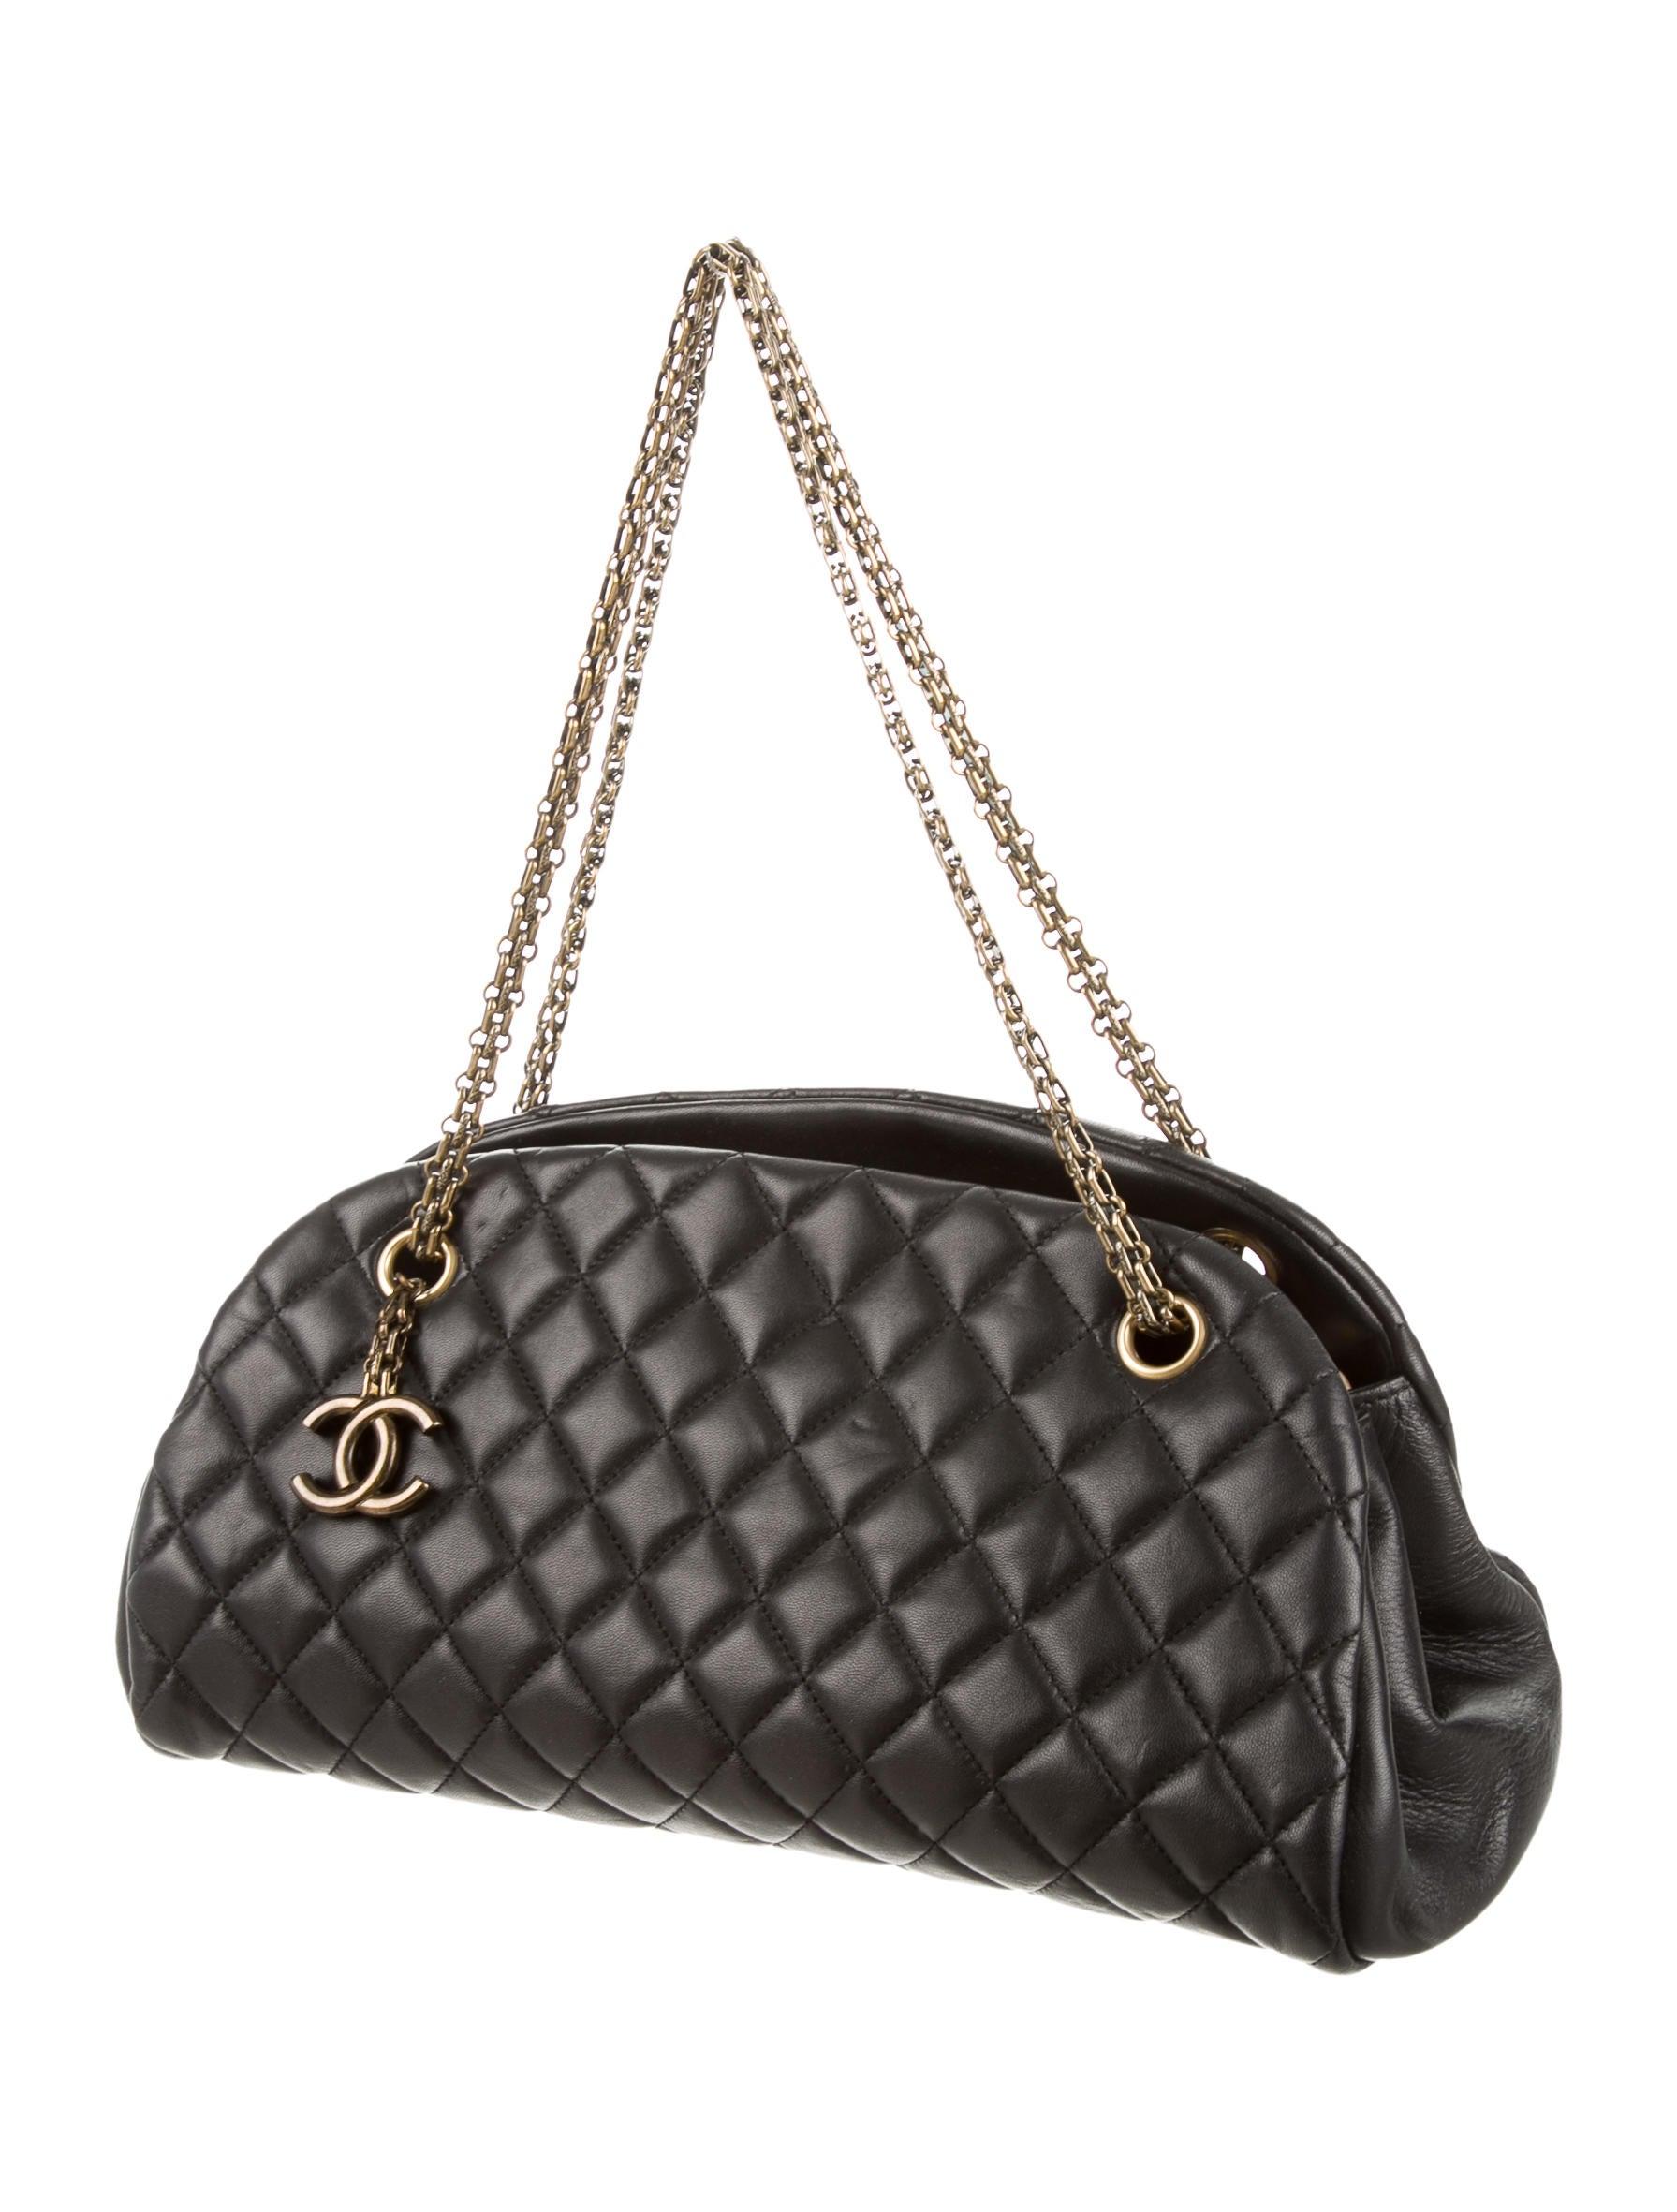 Korea Lambskin Handbag Genuine Sheepskin Leather Women Quilted Shoulder Bag